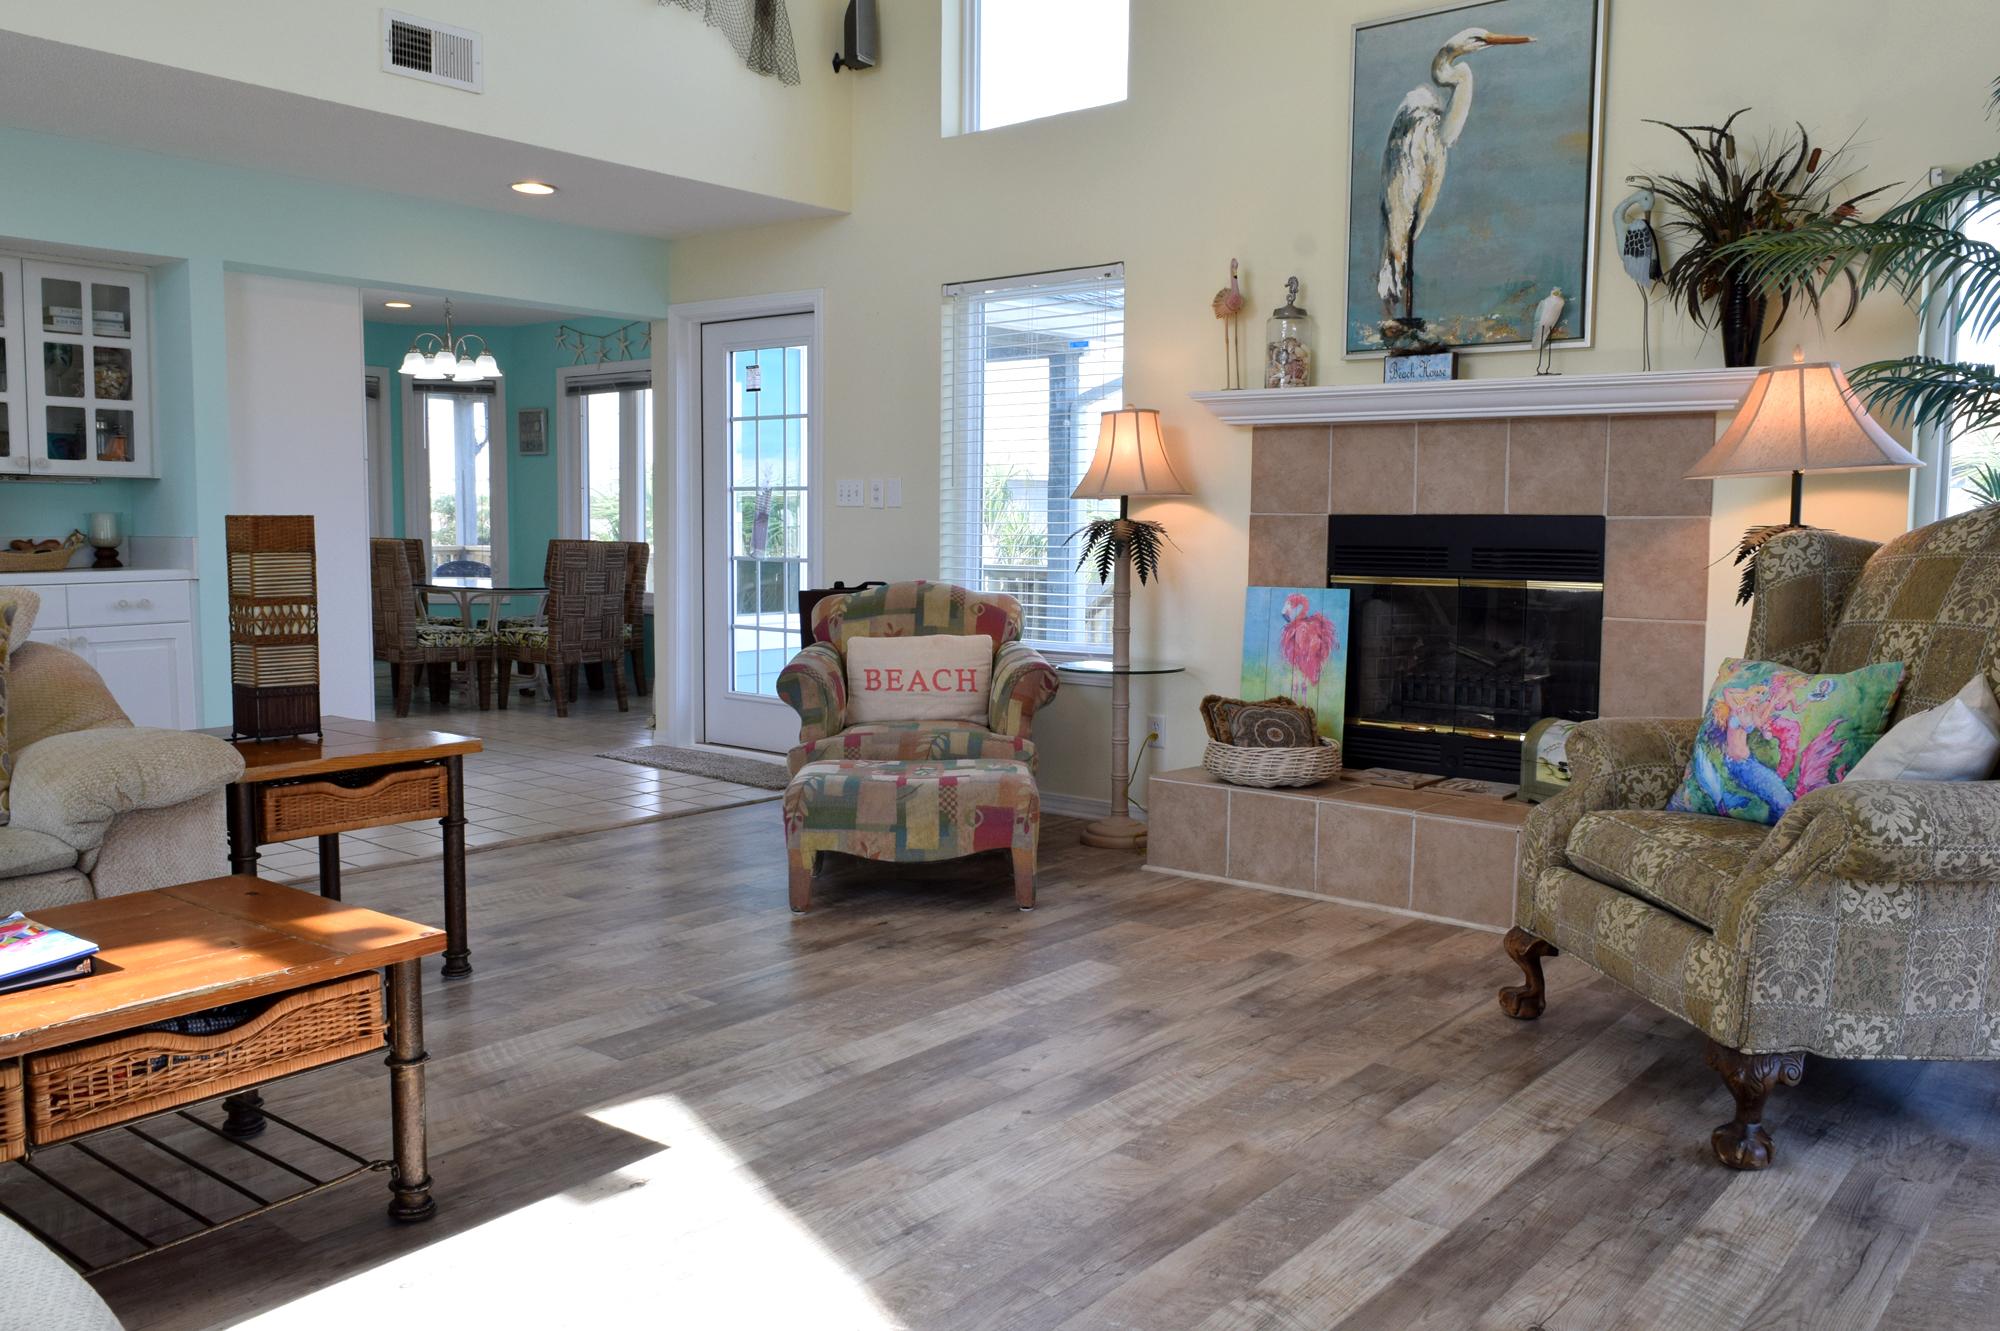 Maldonado 1103 House/Cottage rental in Pensacola Beach House Rentals in Pensacola Beach Florida - #5